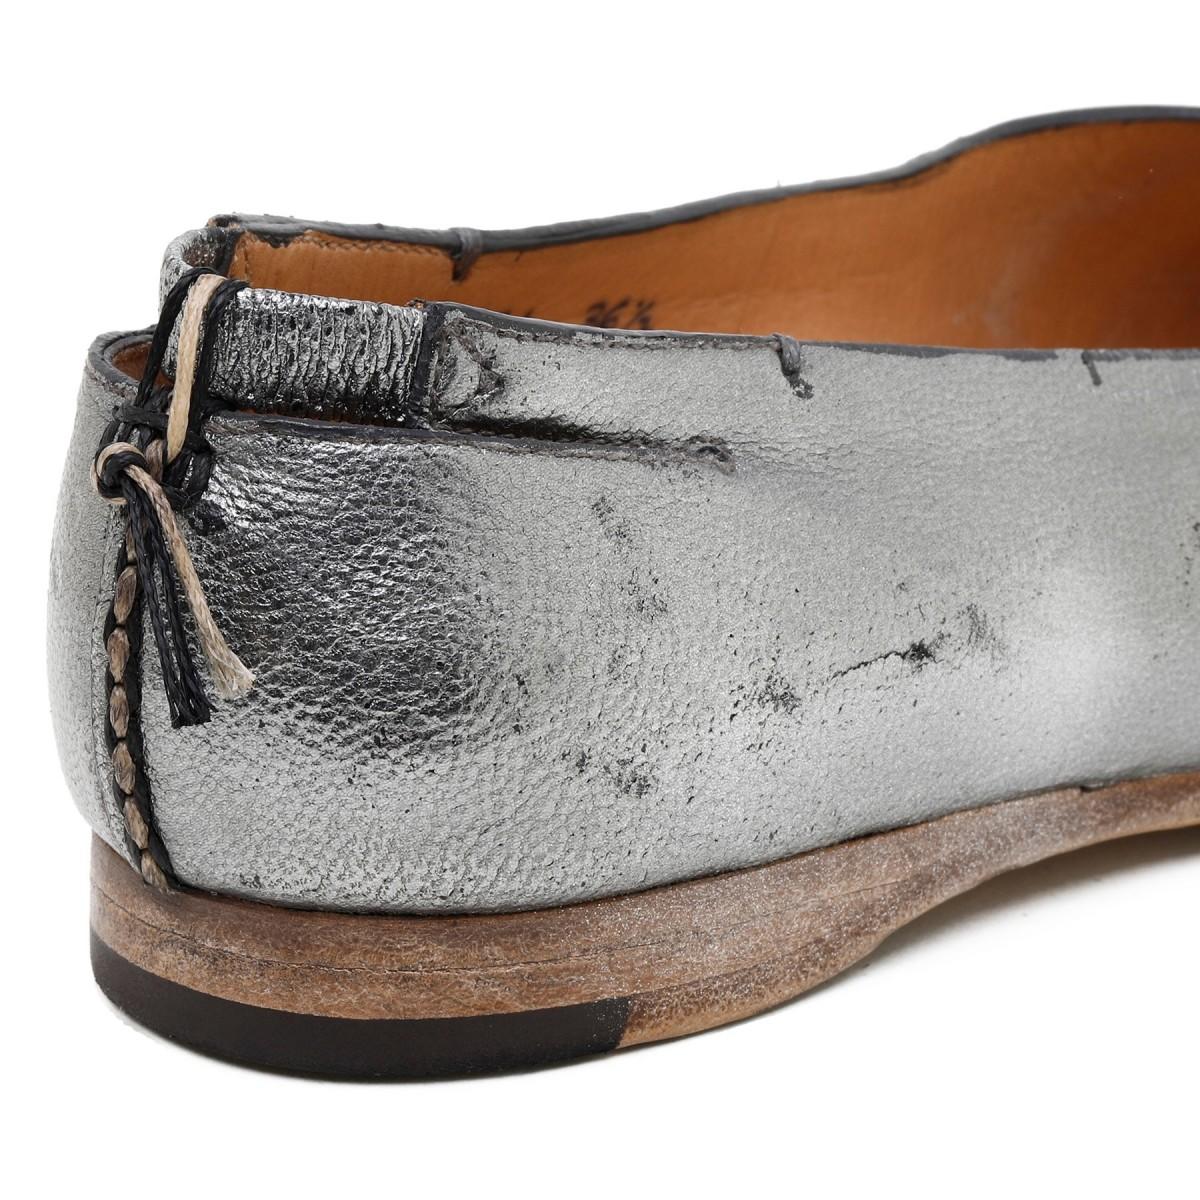 Metallic silver slippers